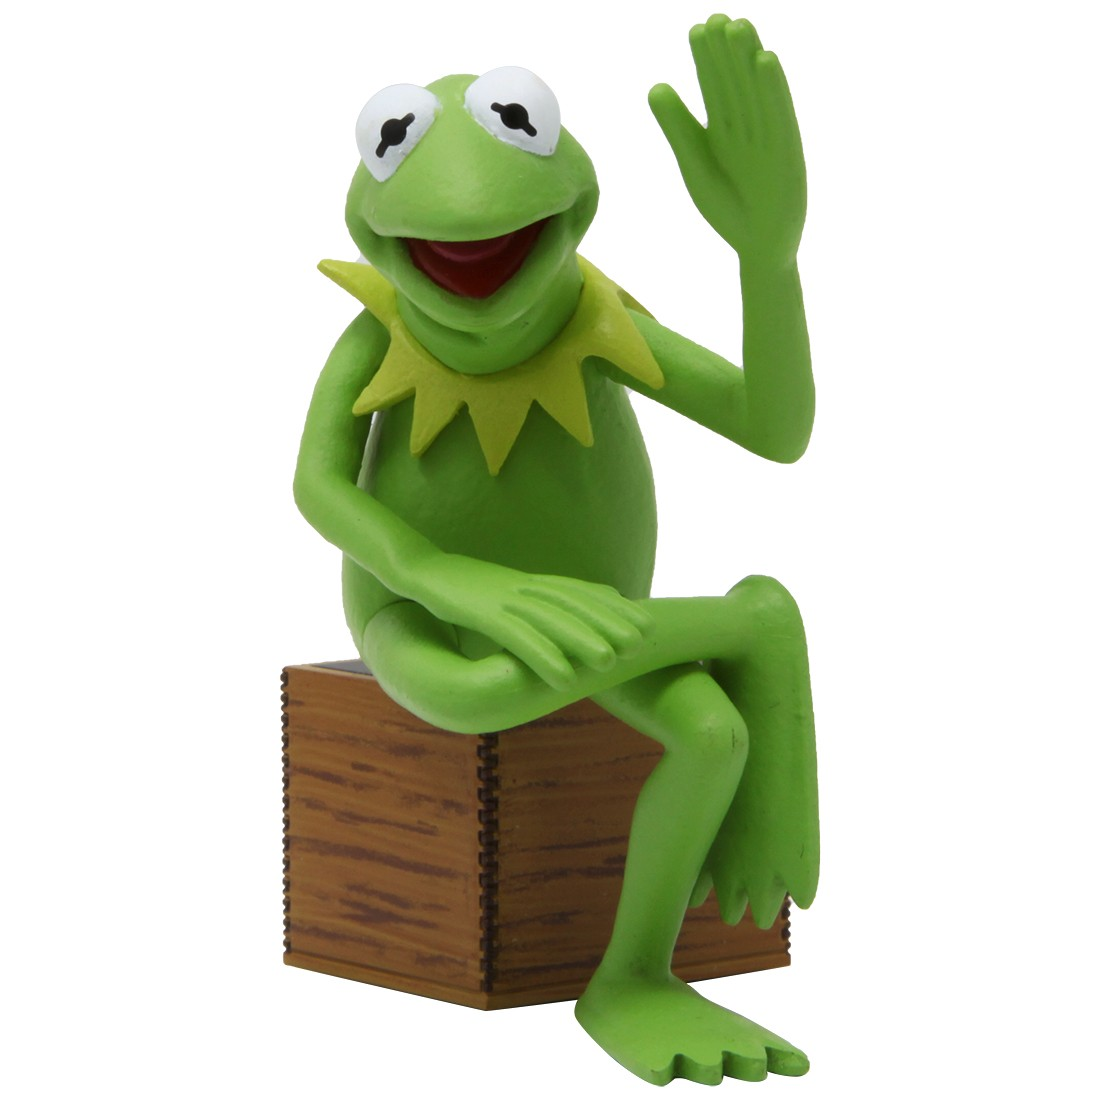 Medicom UDF Disney Series 8 Kermit The Frog Ultra Detail Figure (green)